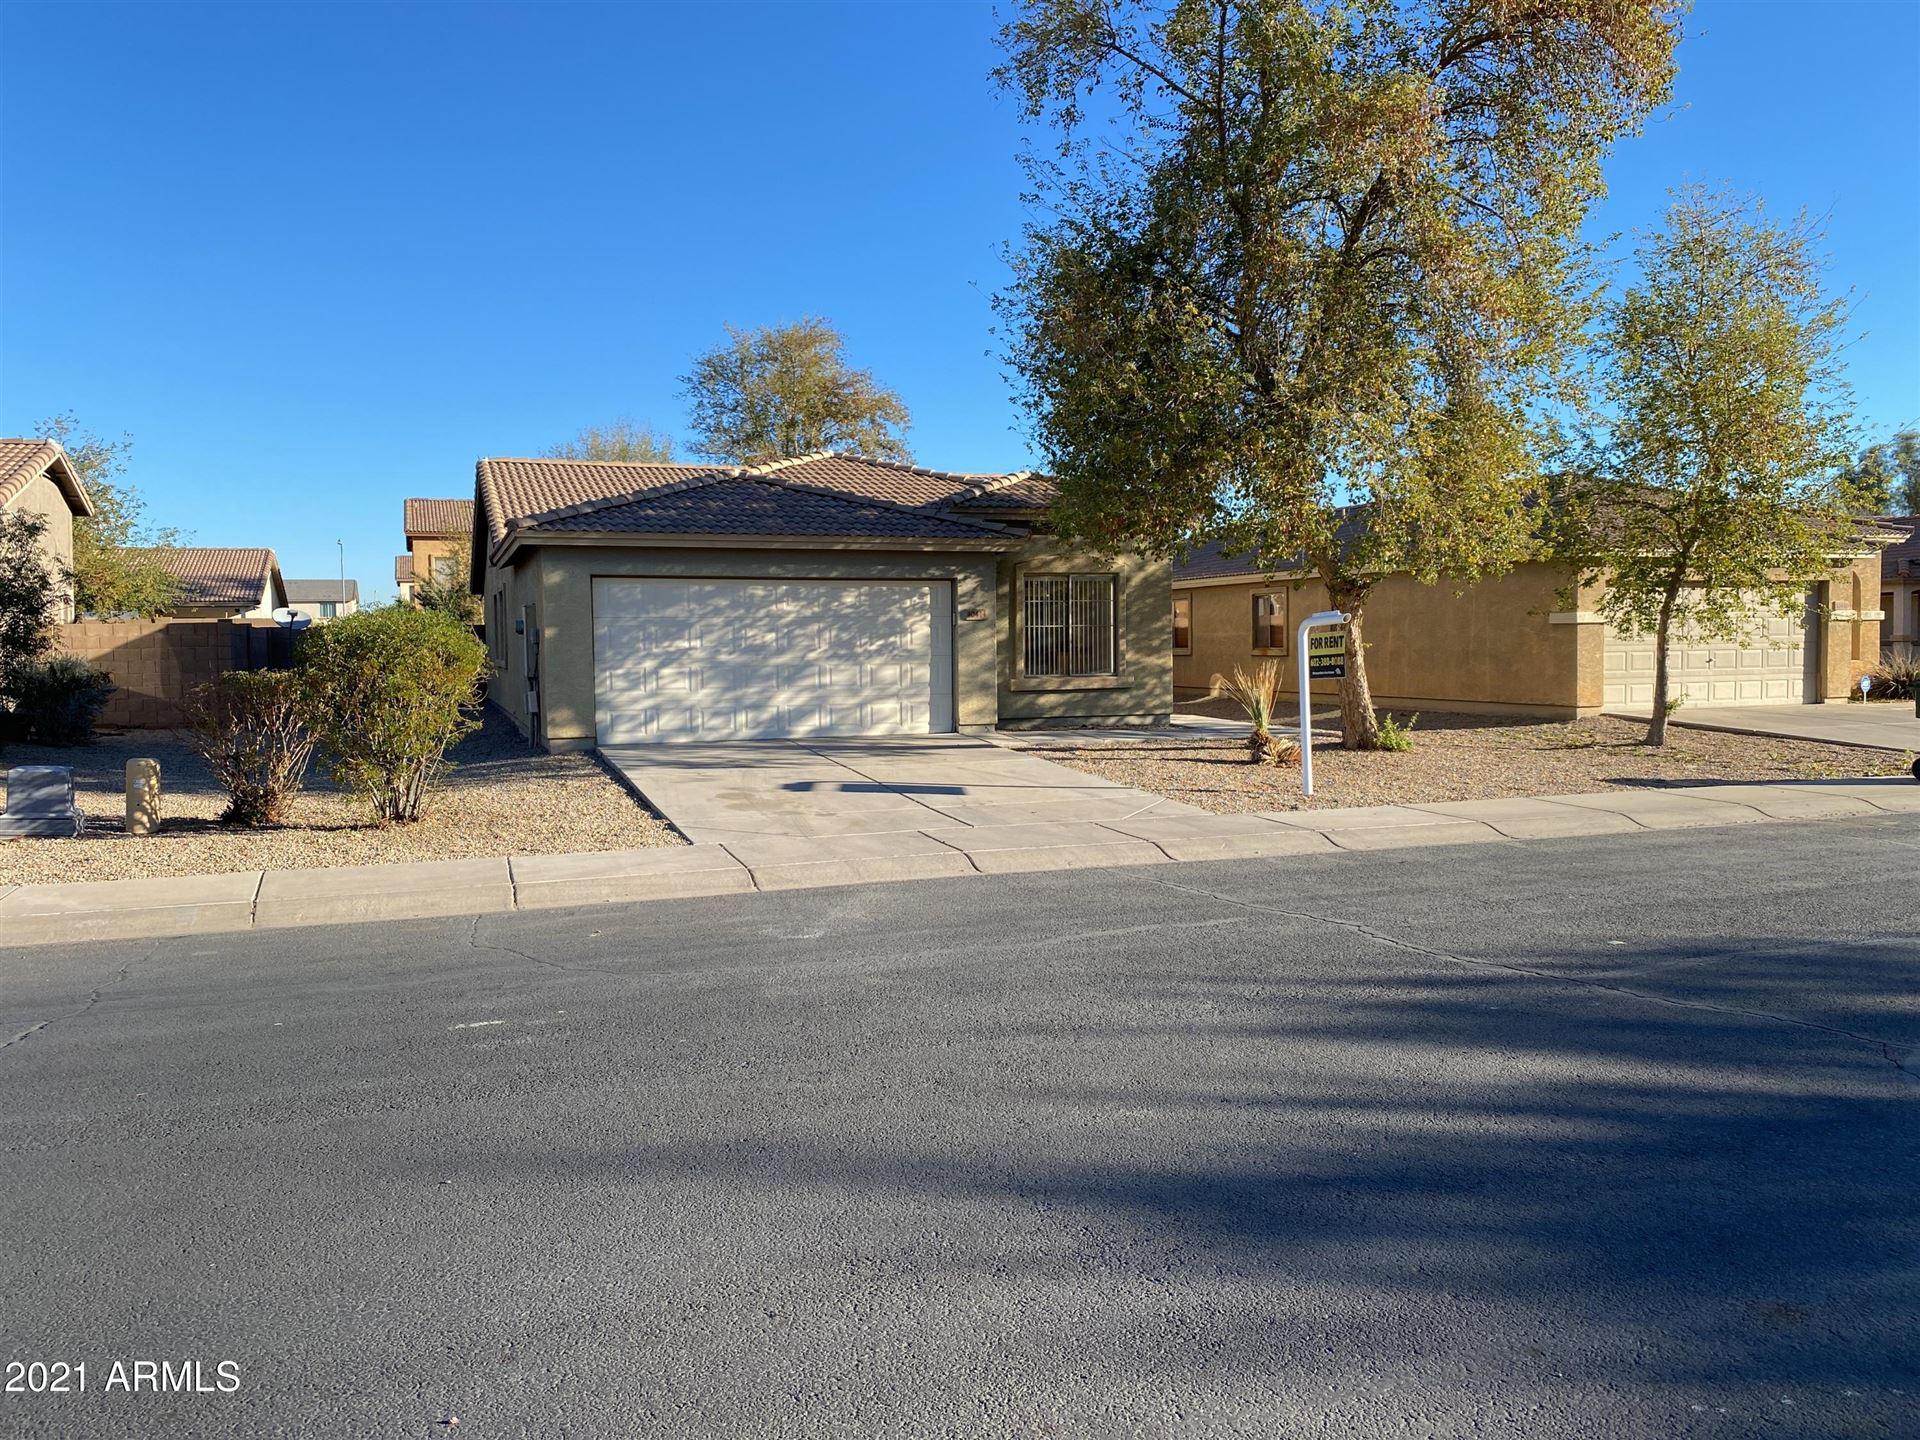 Photo of 10414 W PIONEER Street, Tolleson, AZ 85353 (MLS # 6198057)